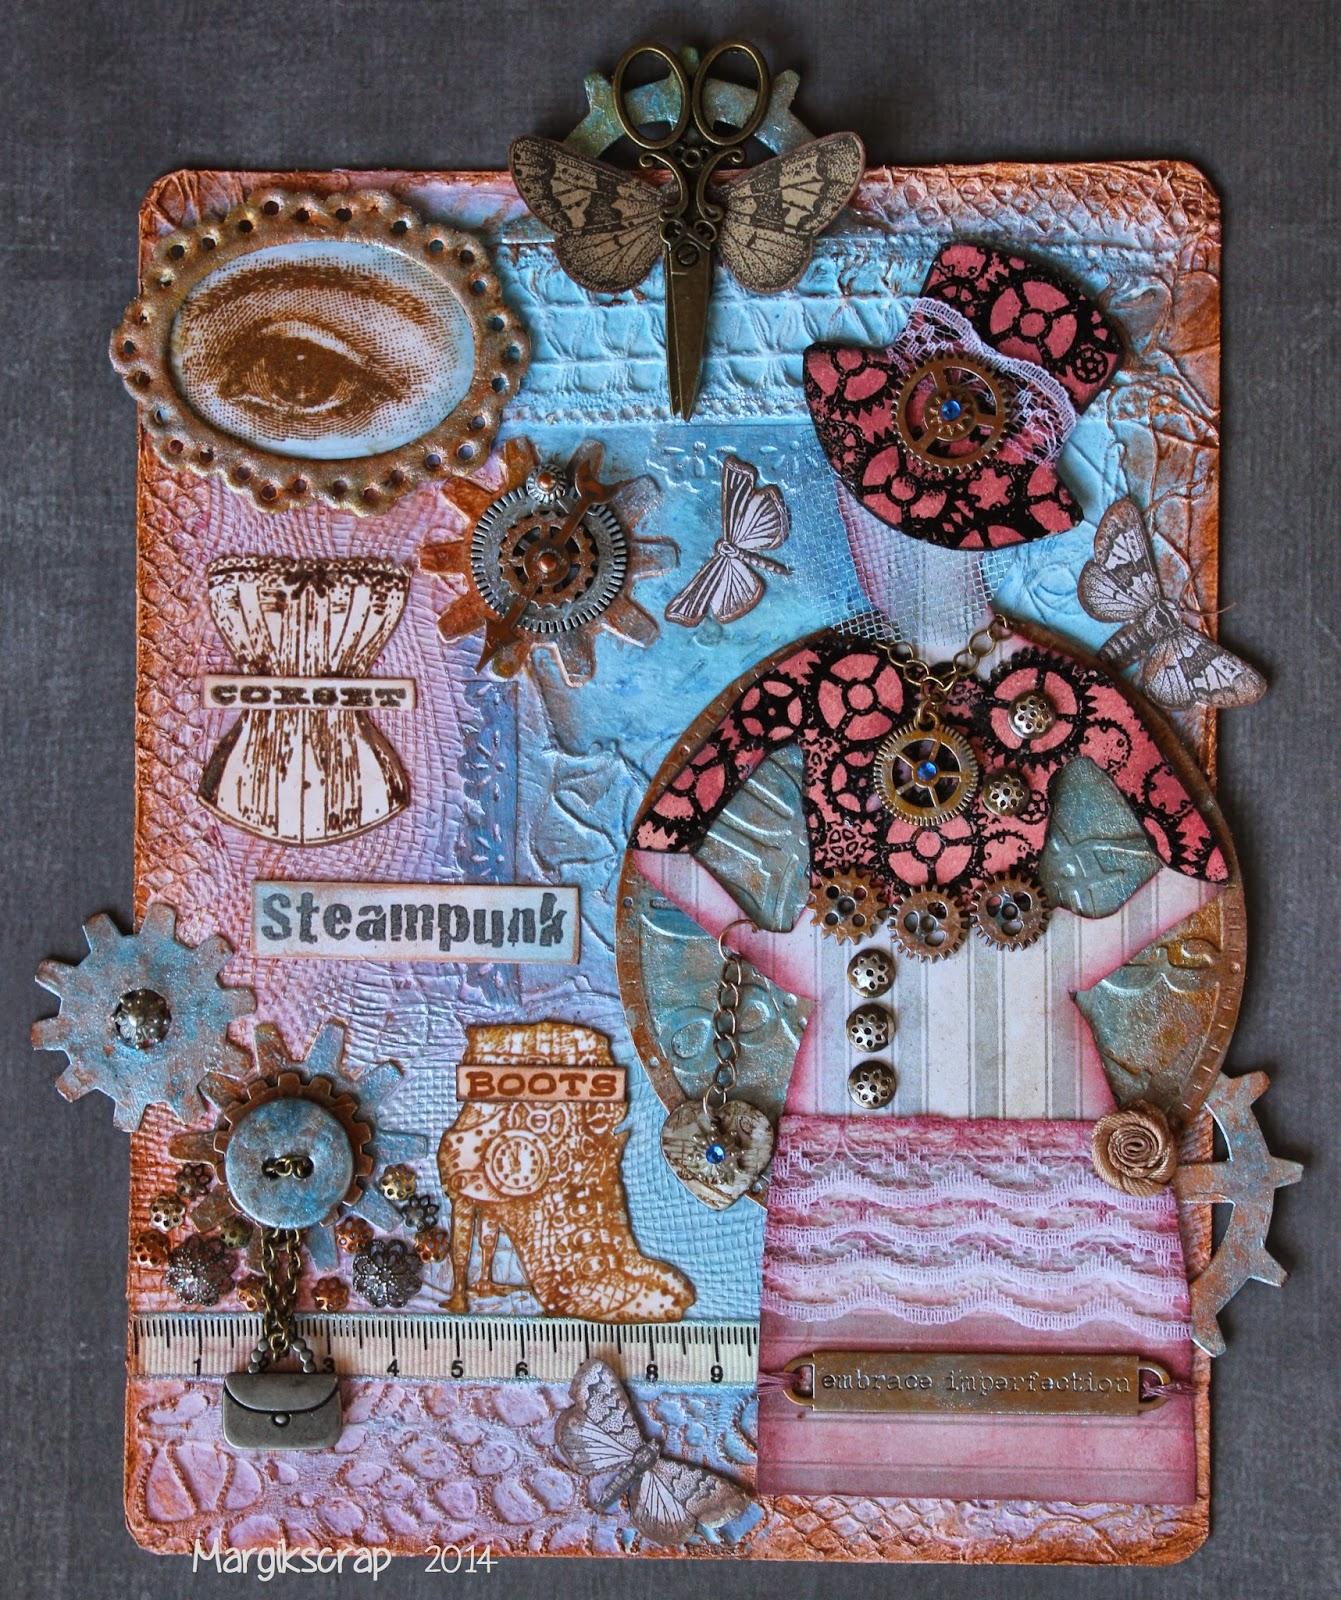 http://margikscrap.blogspot.com.es/2014/10/steampunk-couture.html